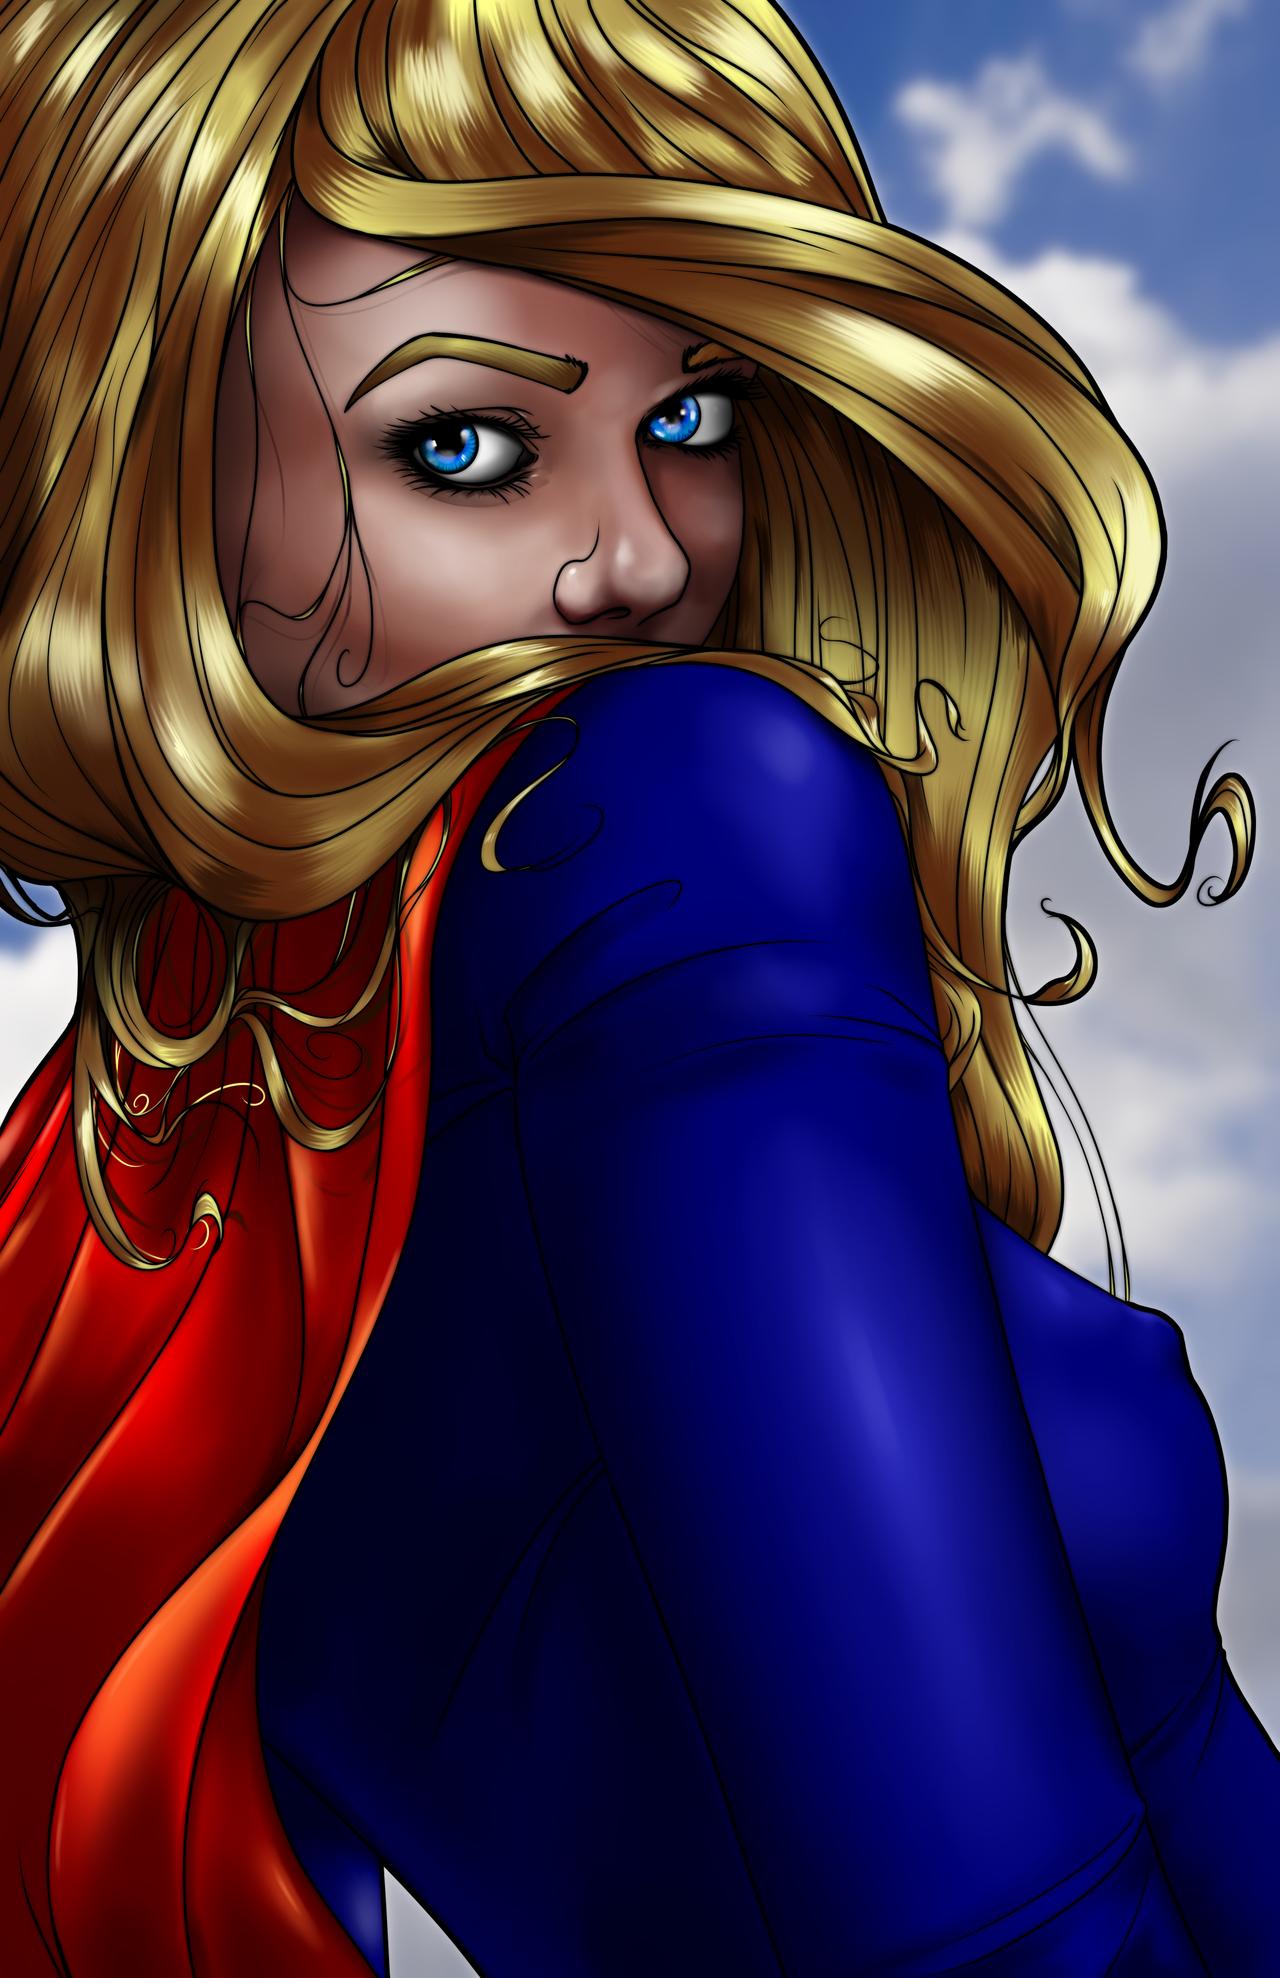 supergirl reduxsmall.png